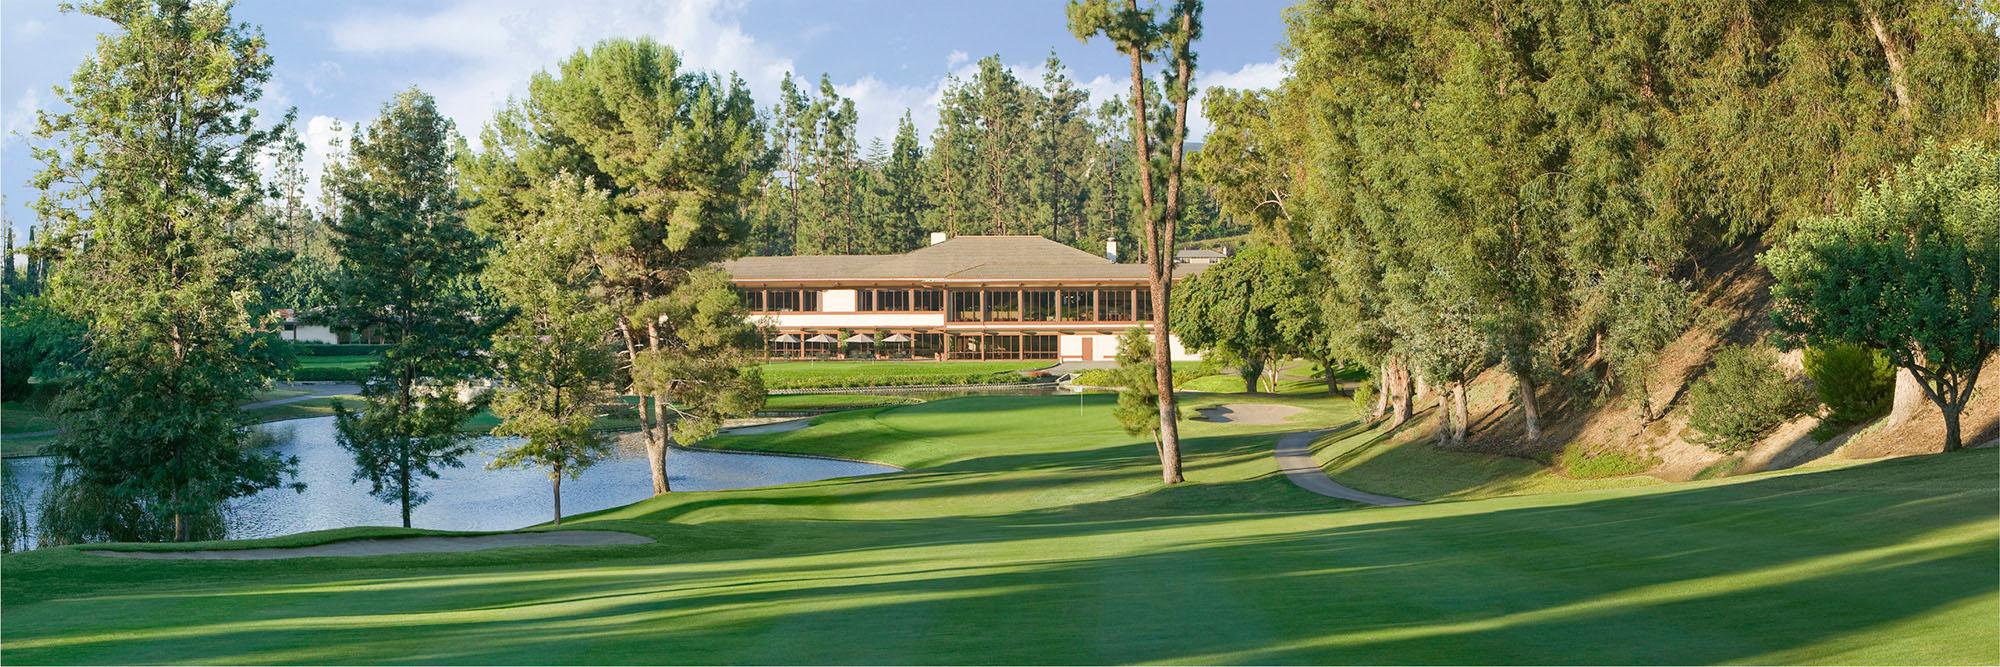 Friendly Hills Country Club